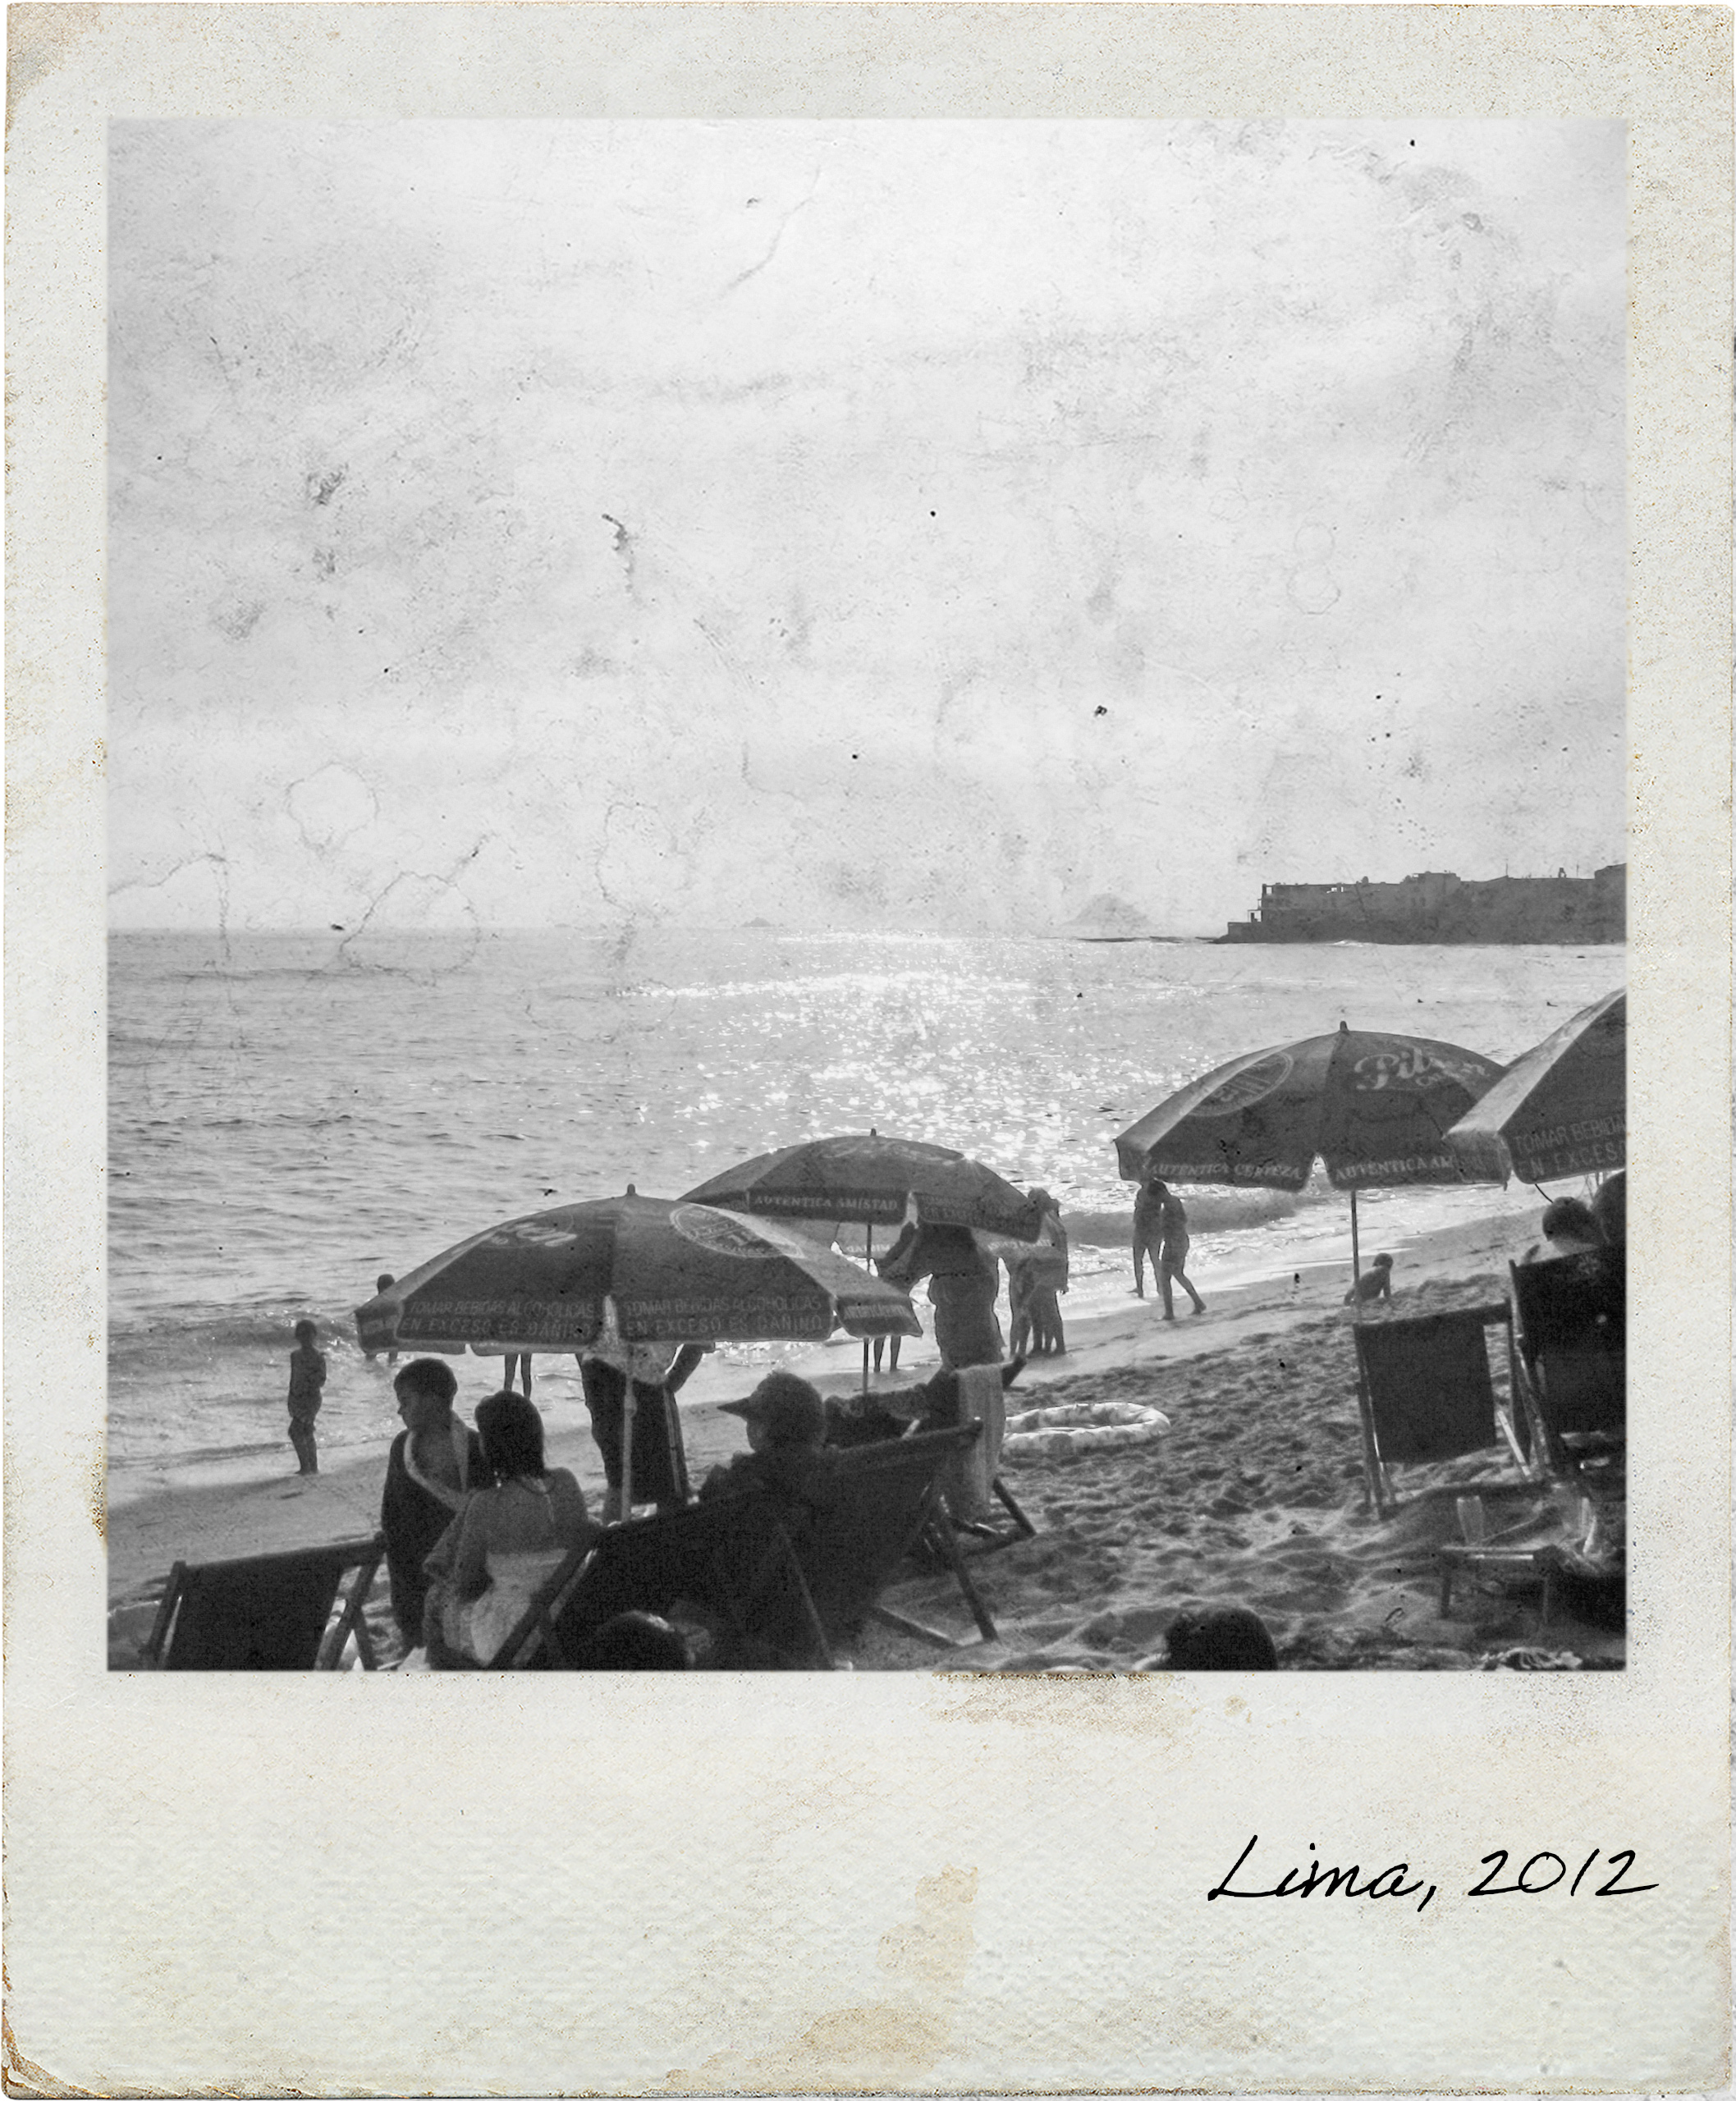 Beach in Lima